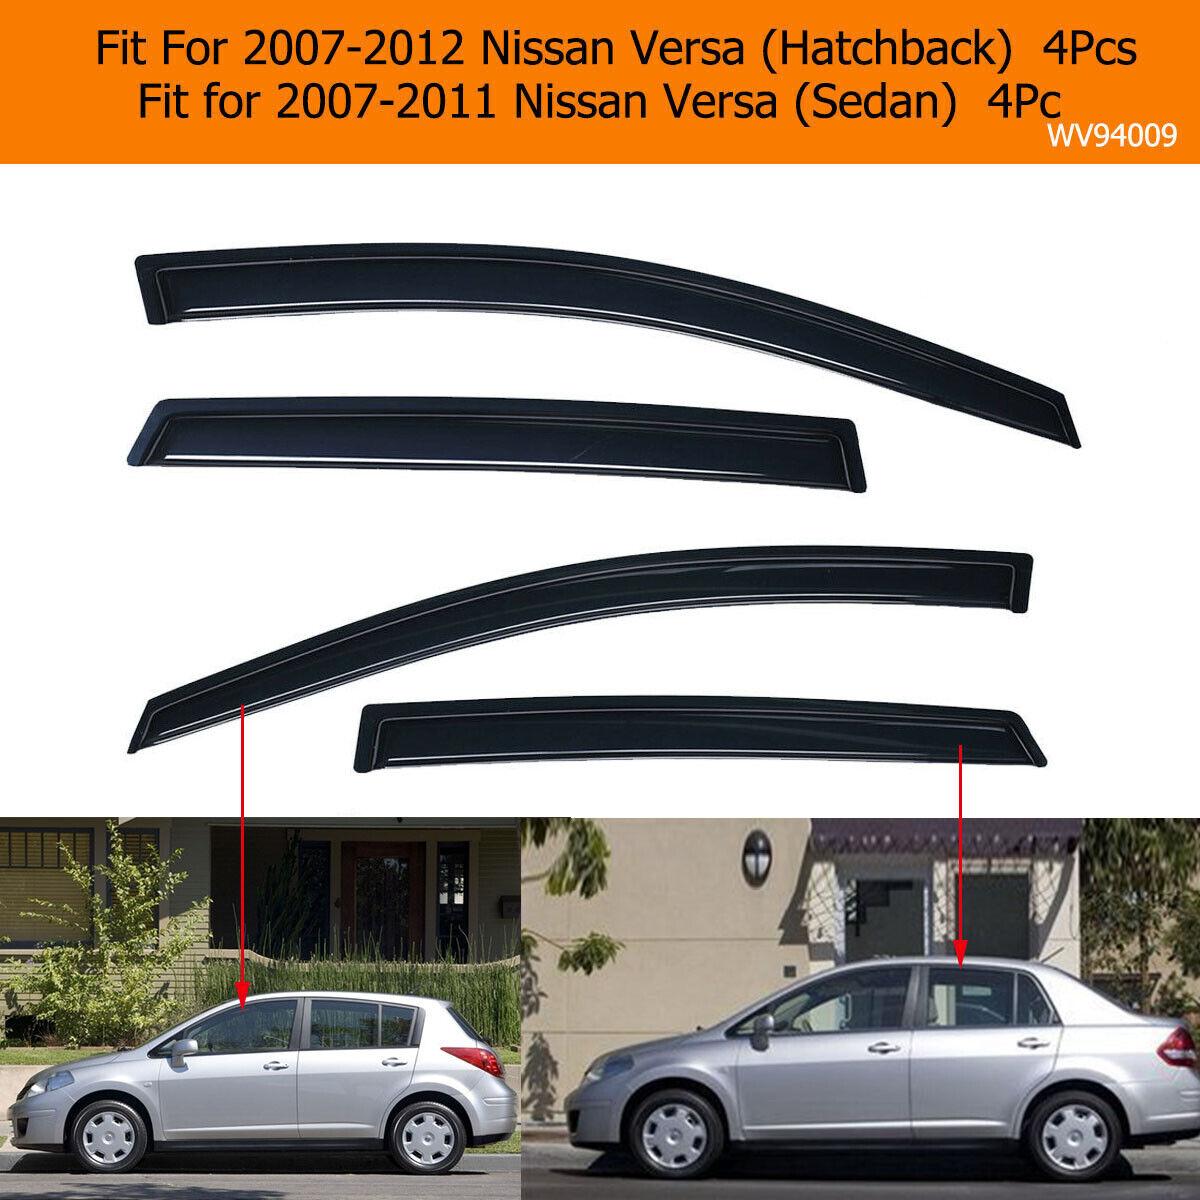 4pcs Visor Rain Guards Wind Deflector For Nissan Versa 2007-2011 4 Door Sedan